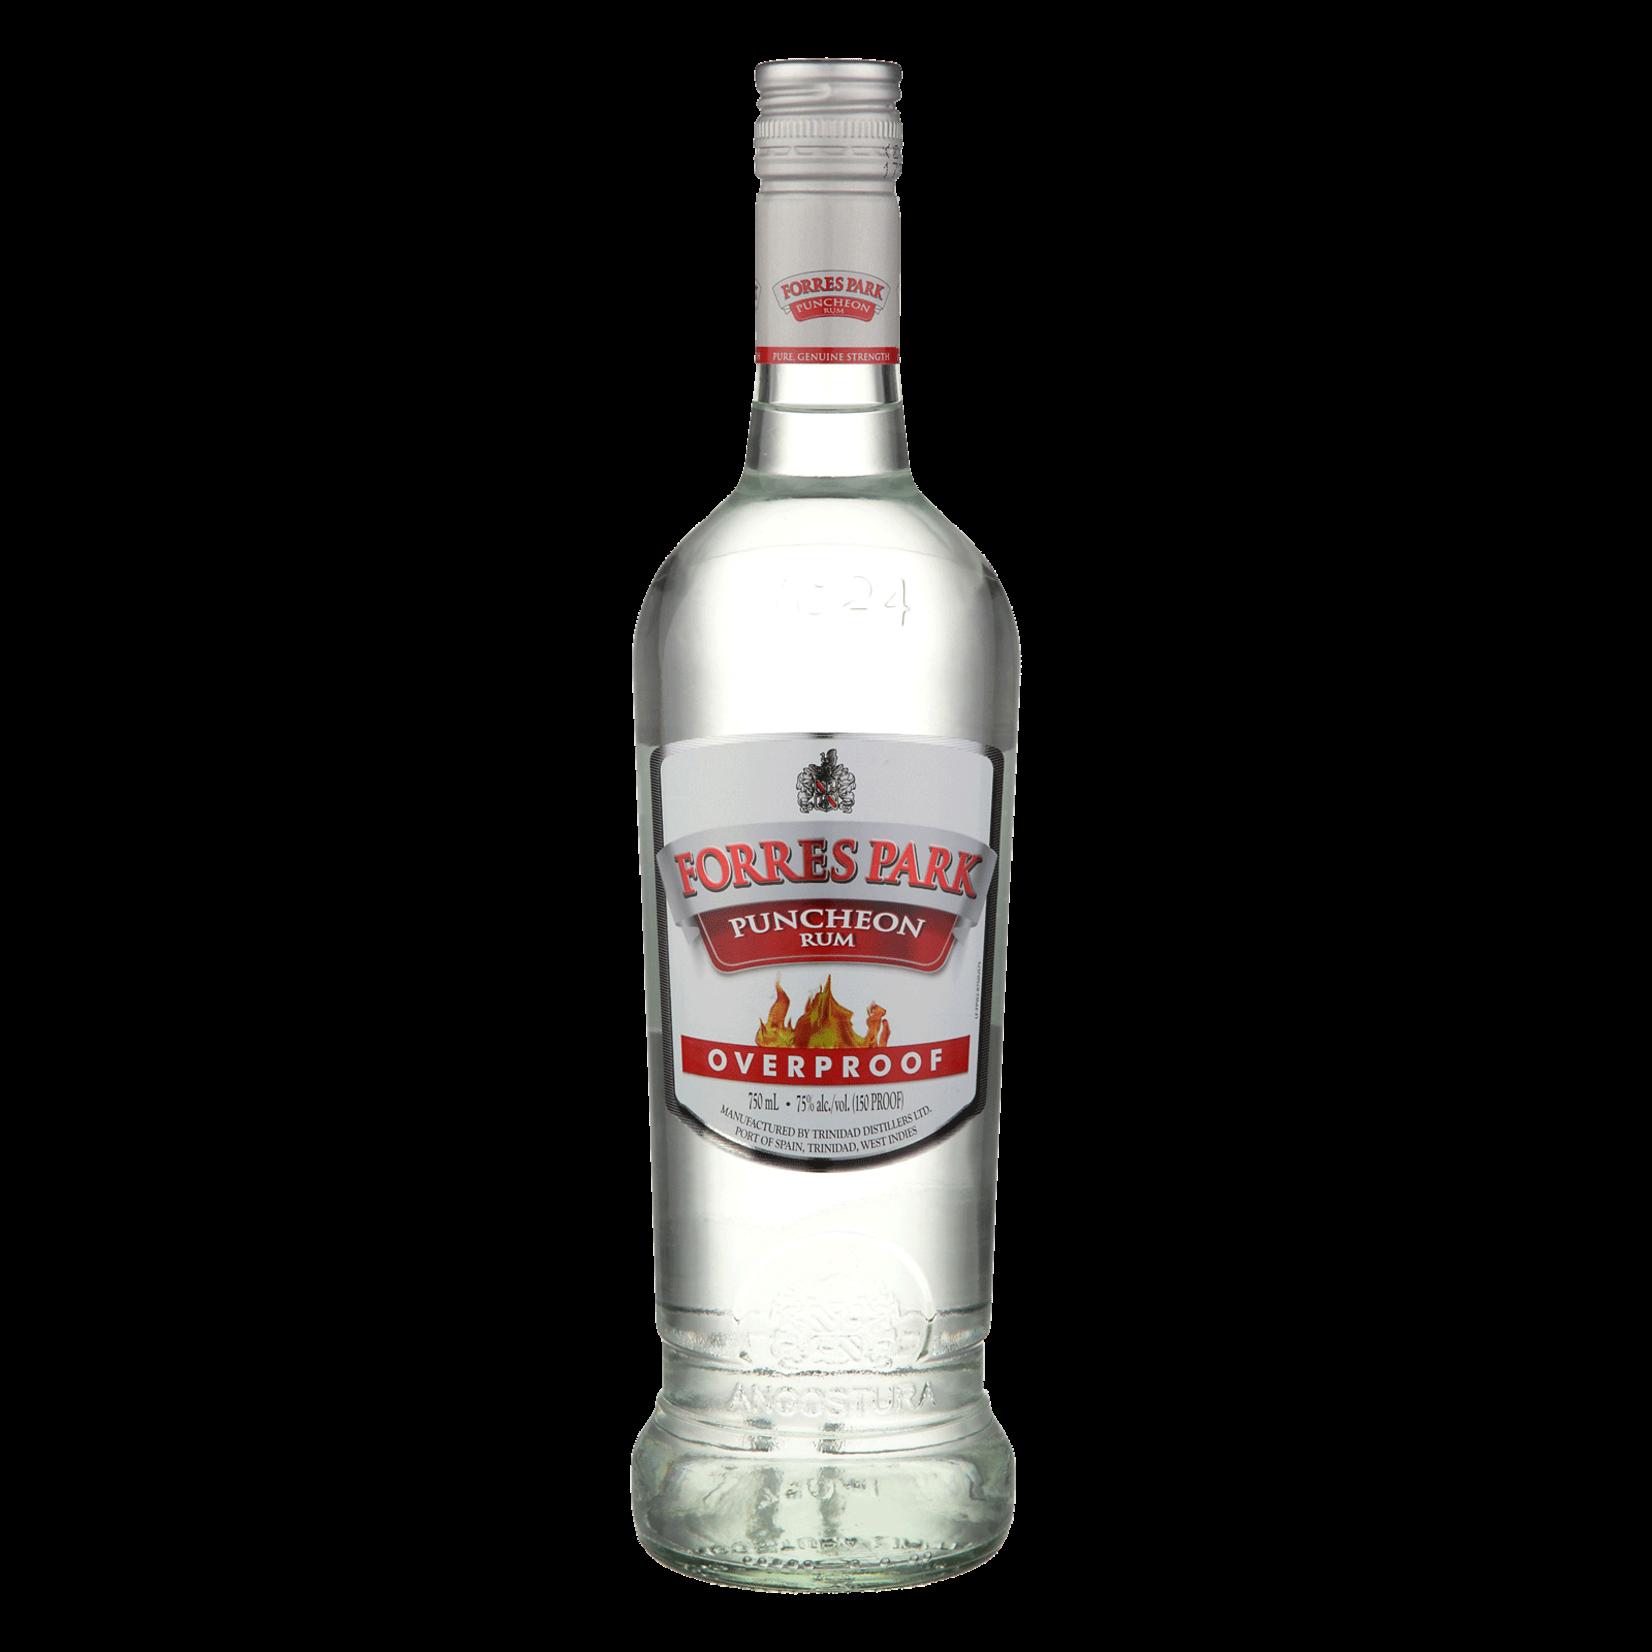 Spirits Angostura Forres Park Puncheon Overproof Rum 150 Proof